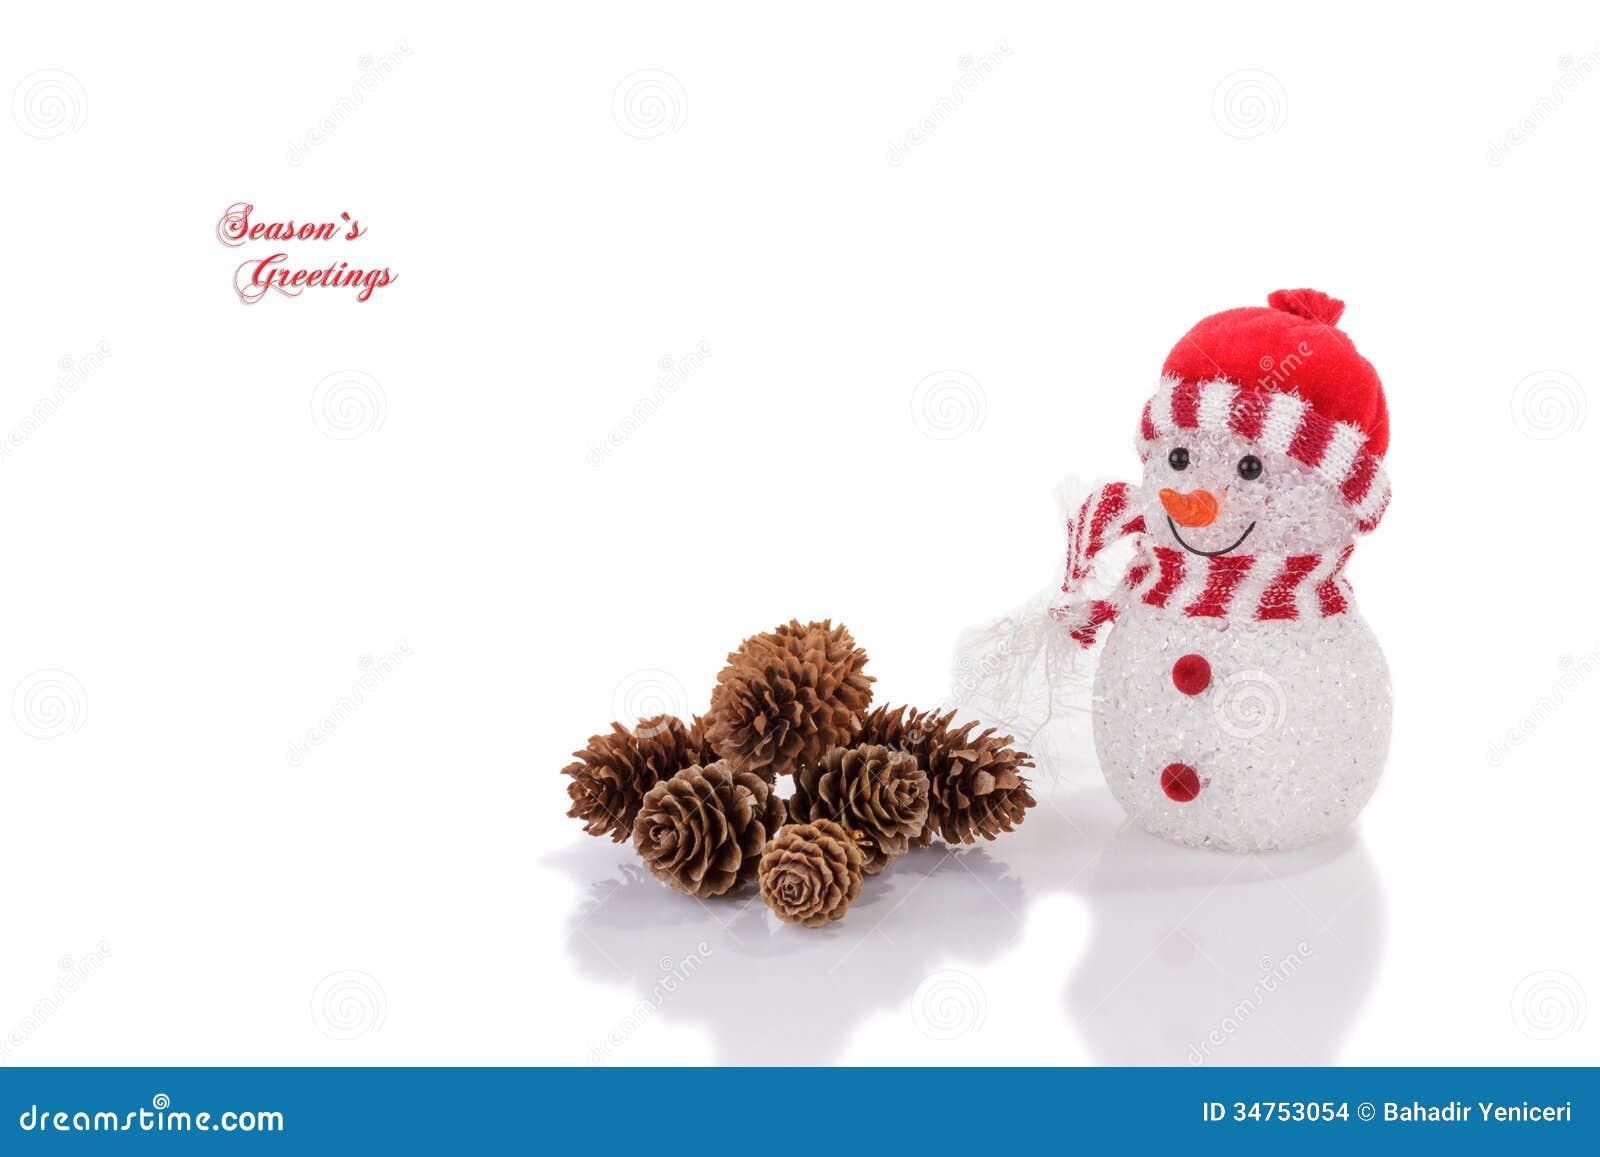 Seasons greetings stock photo image of seasonal scarf 34753054 seasons greetings m4hsunfo